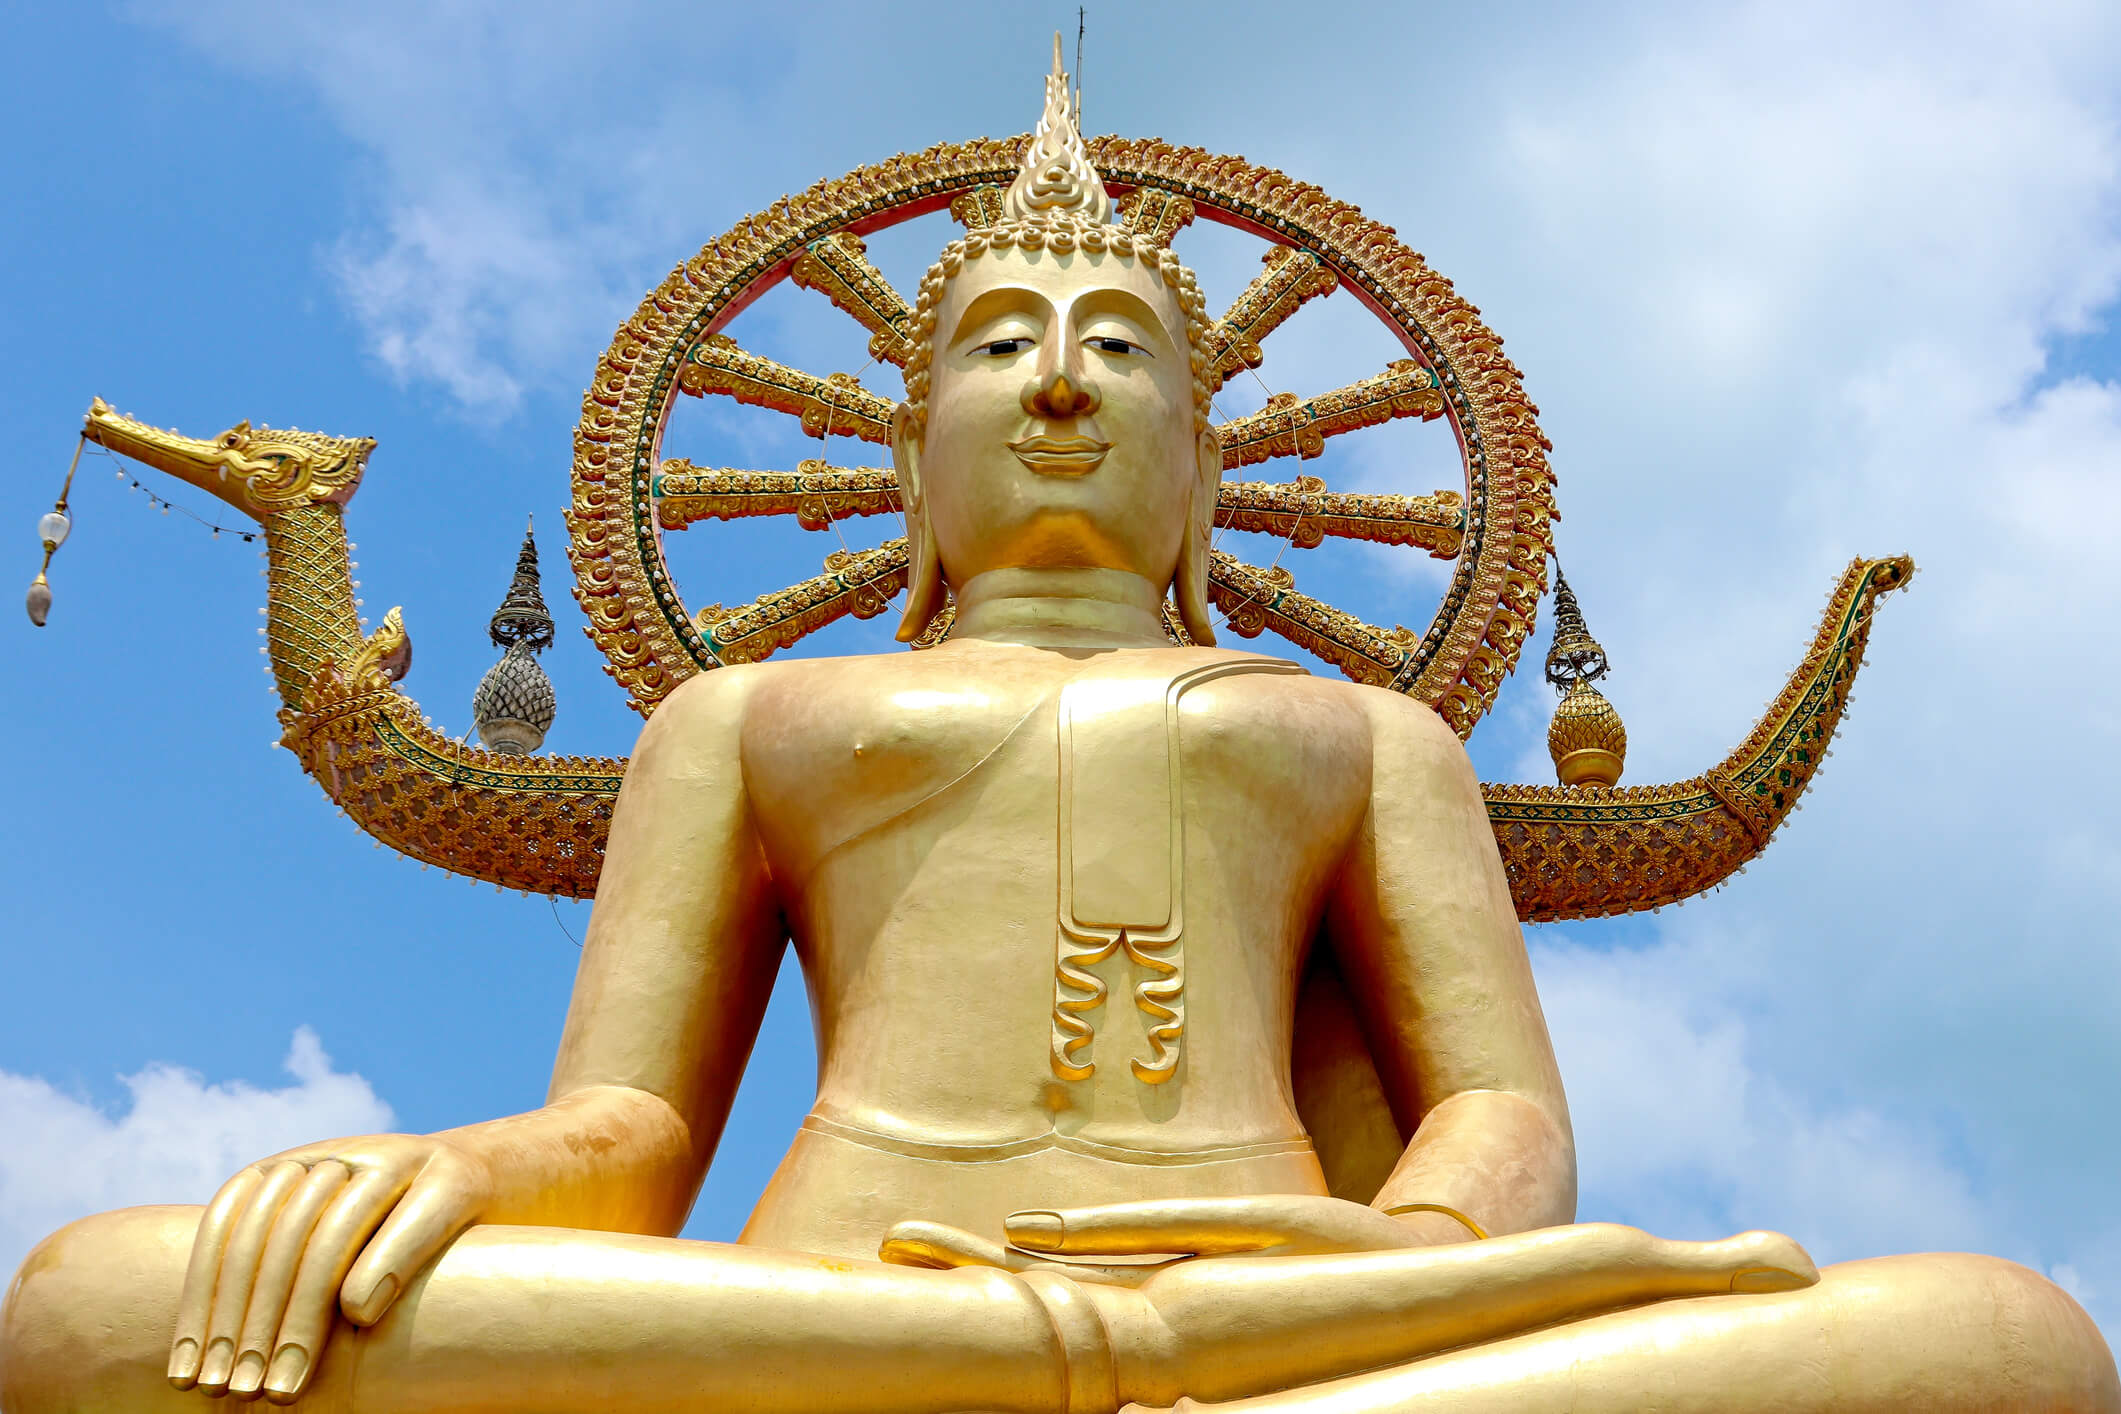 Buddha Temple, Wat Phra Yai temple near Bangrak beach in Koh Samui, Thailand